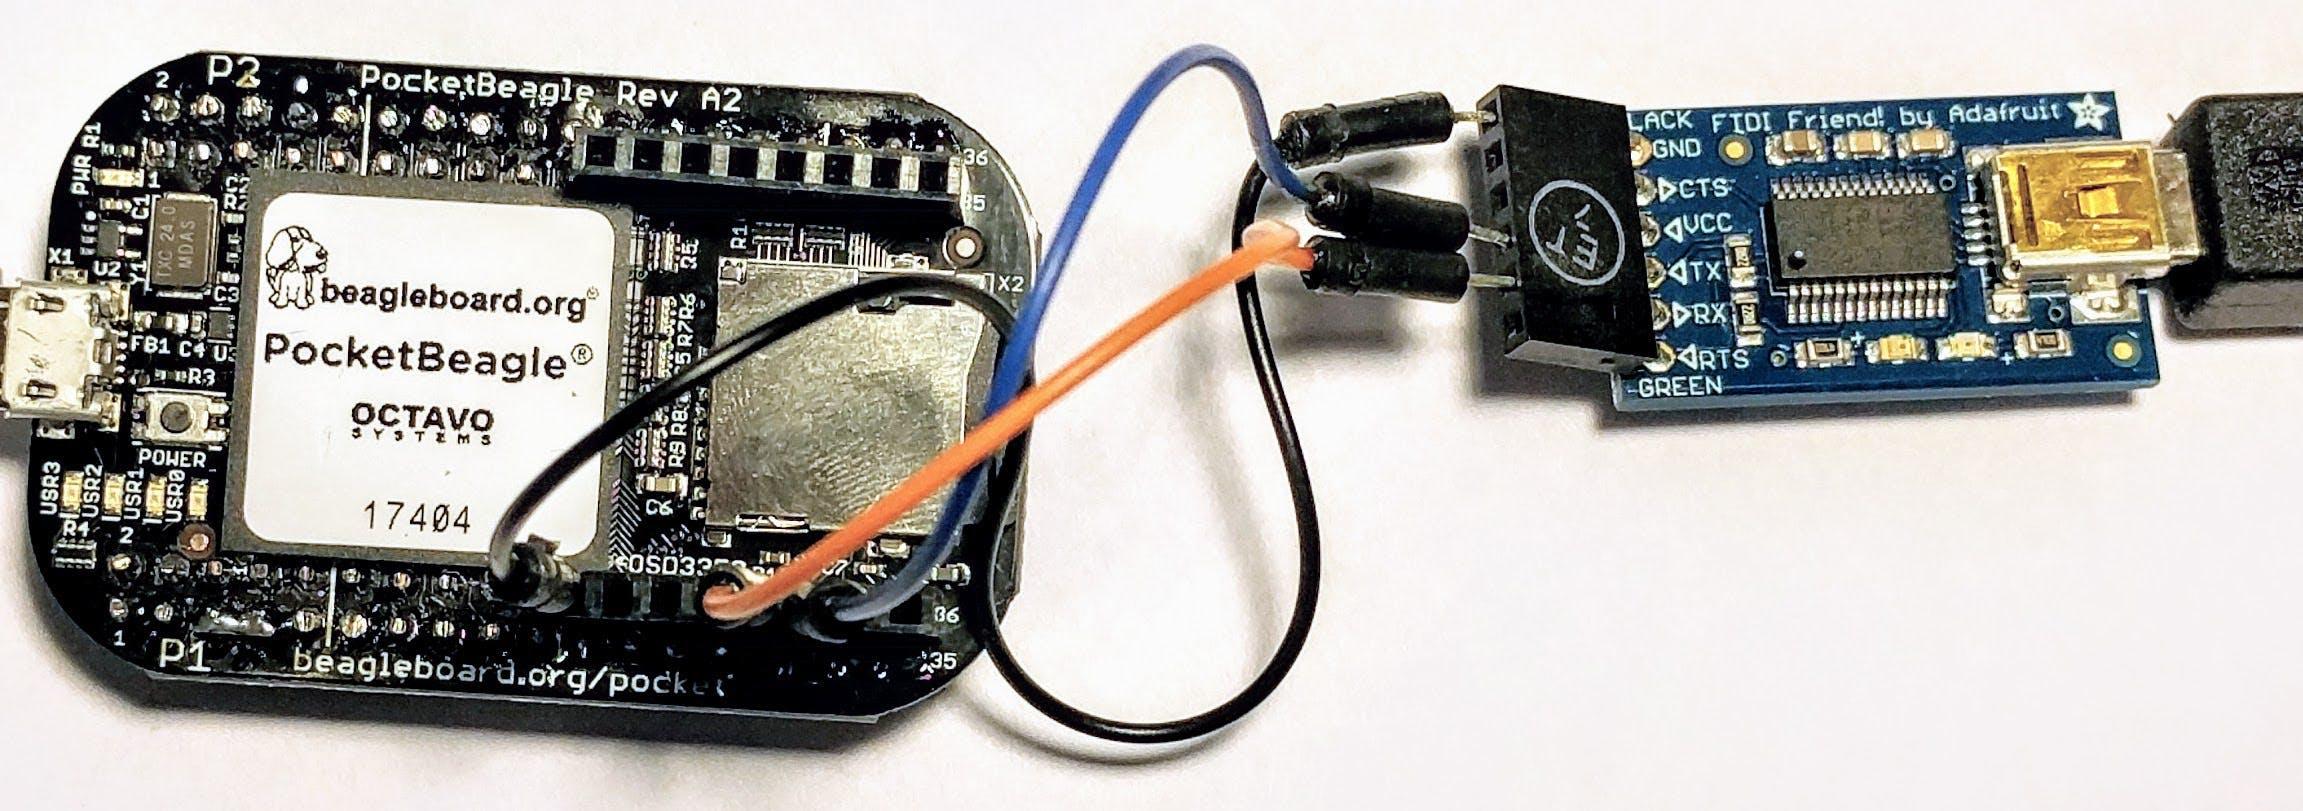 Accessing the PocketBeagle's serial console through an FTDI interface.